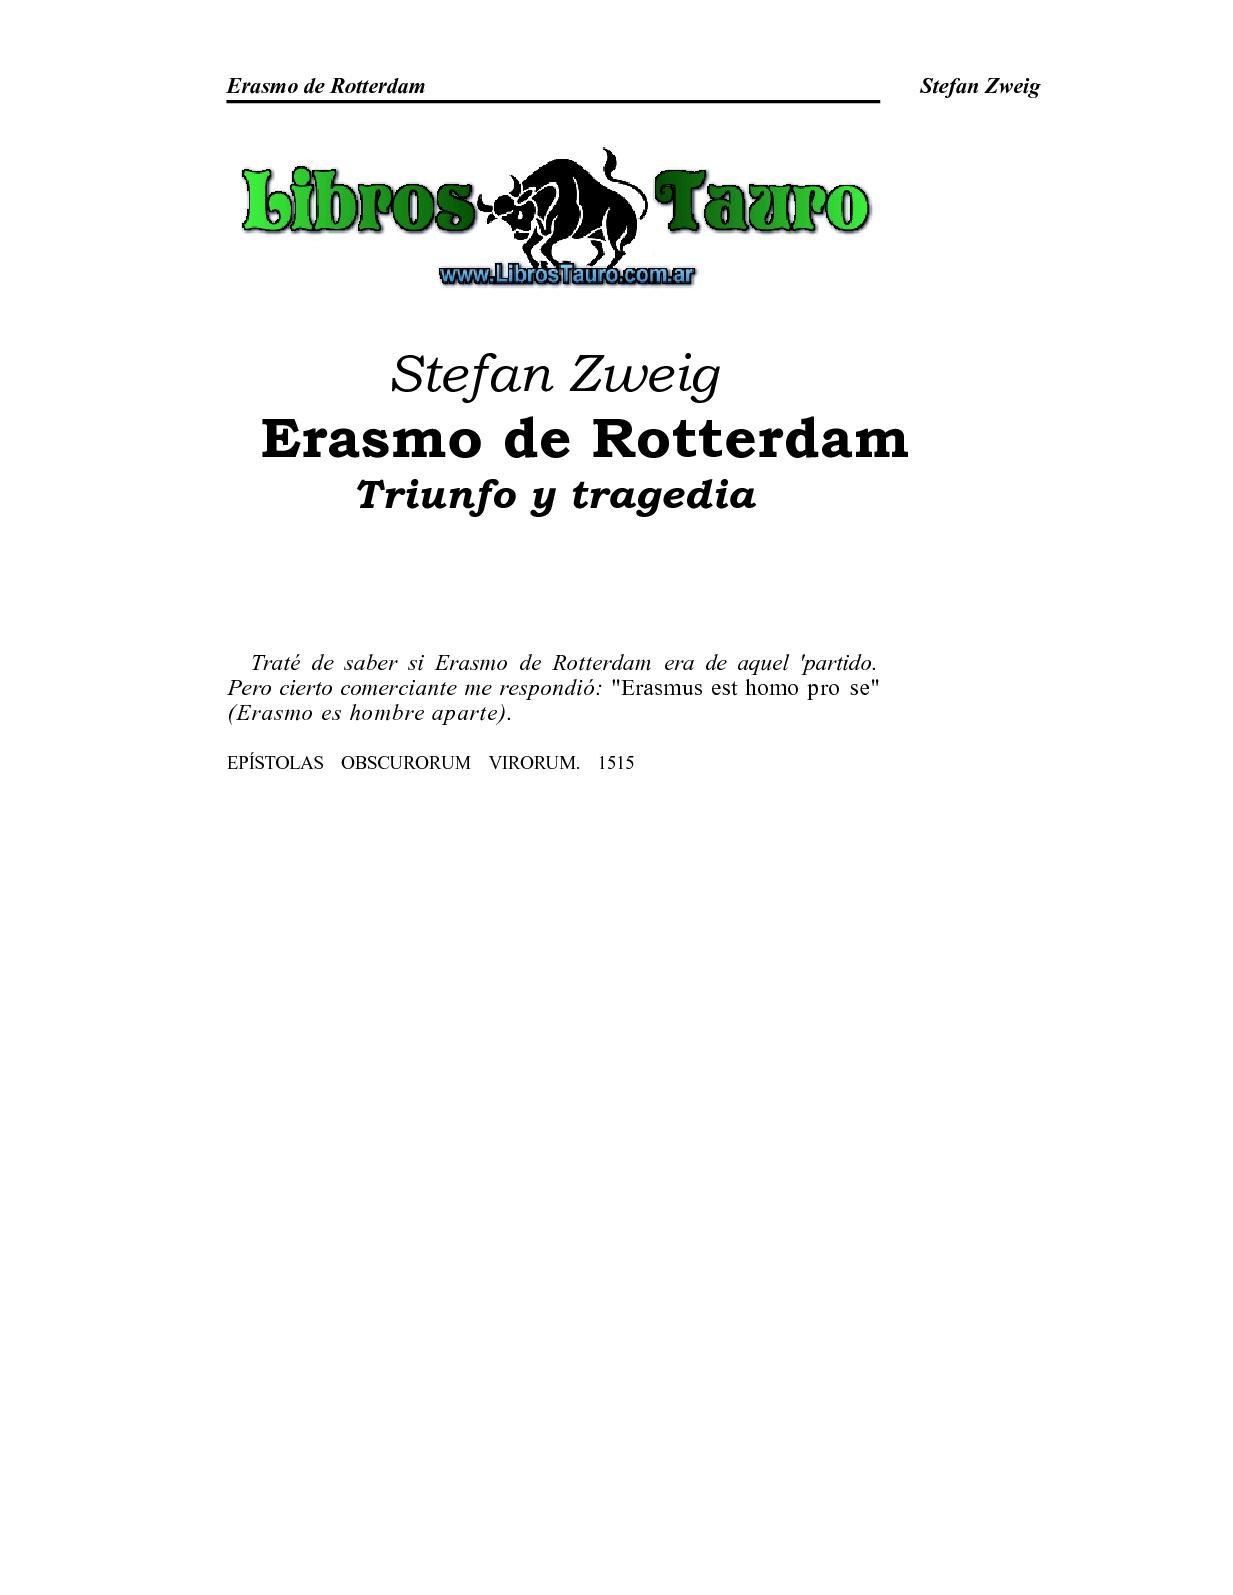 RotterdamTriunfo Erasmo Y Calaméo ZweigStefan De Tragedia oreBxdCW